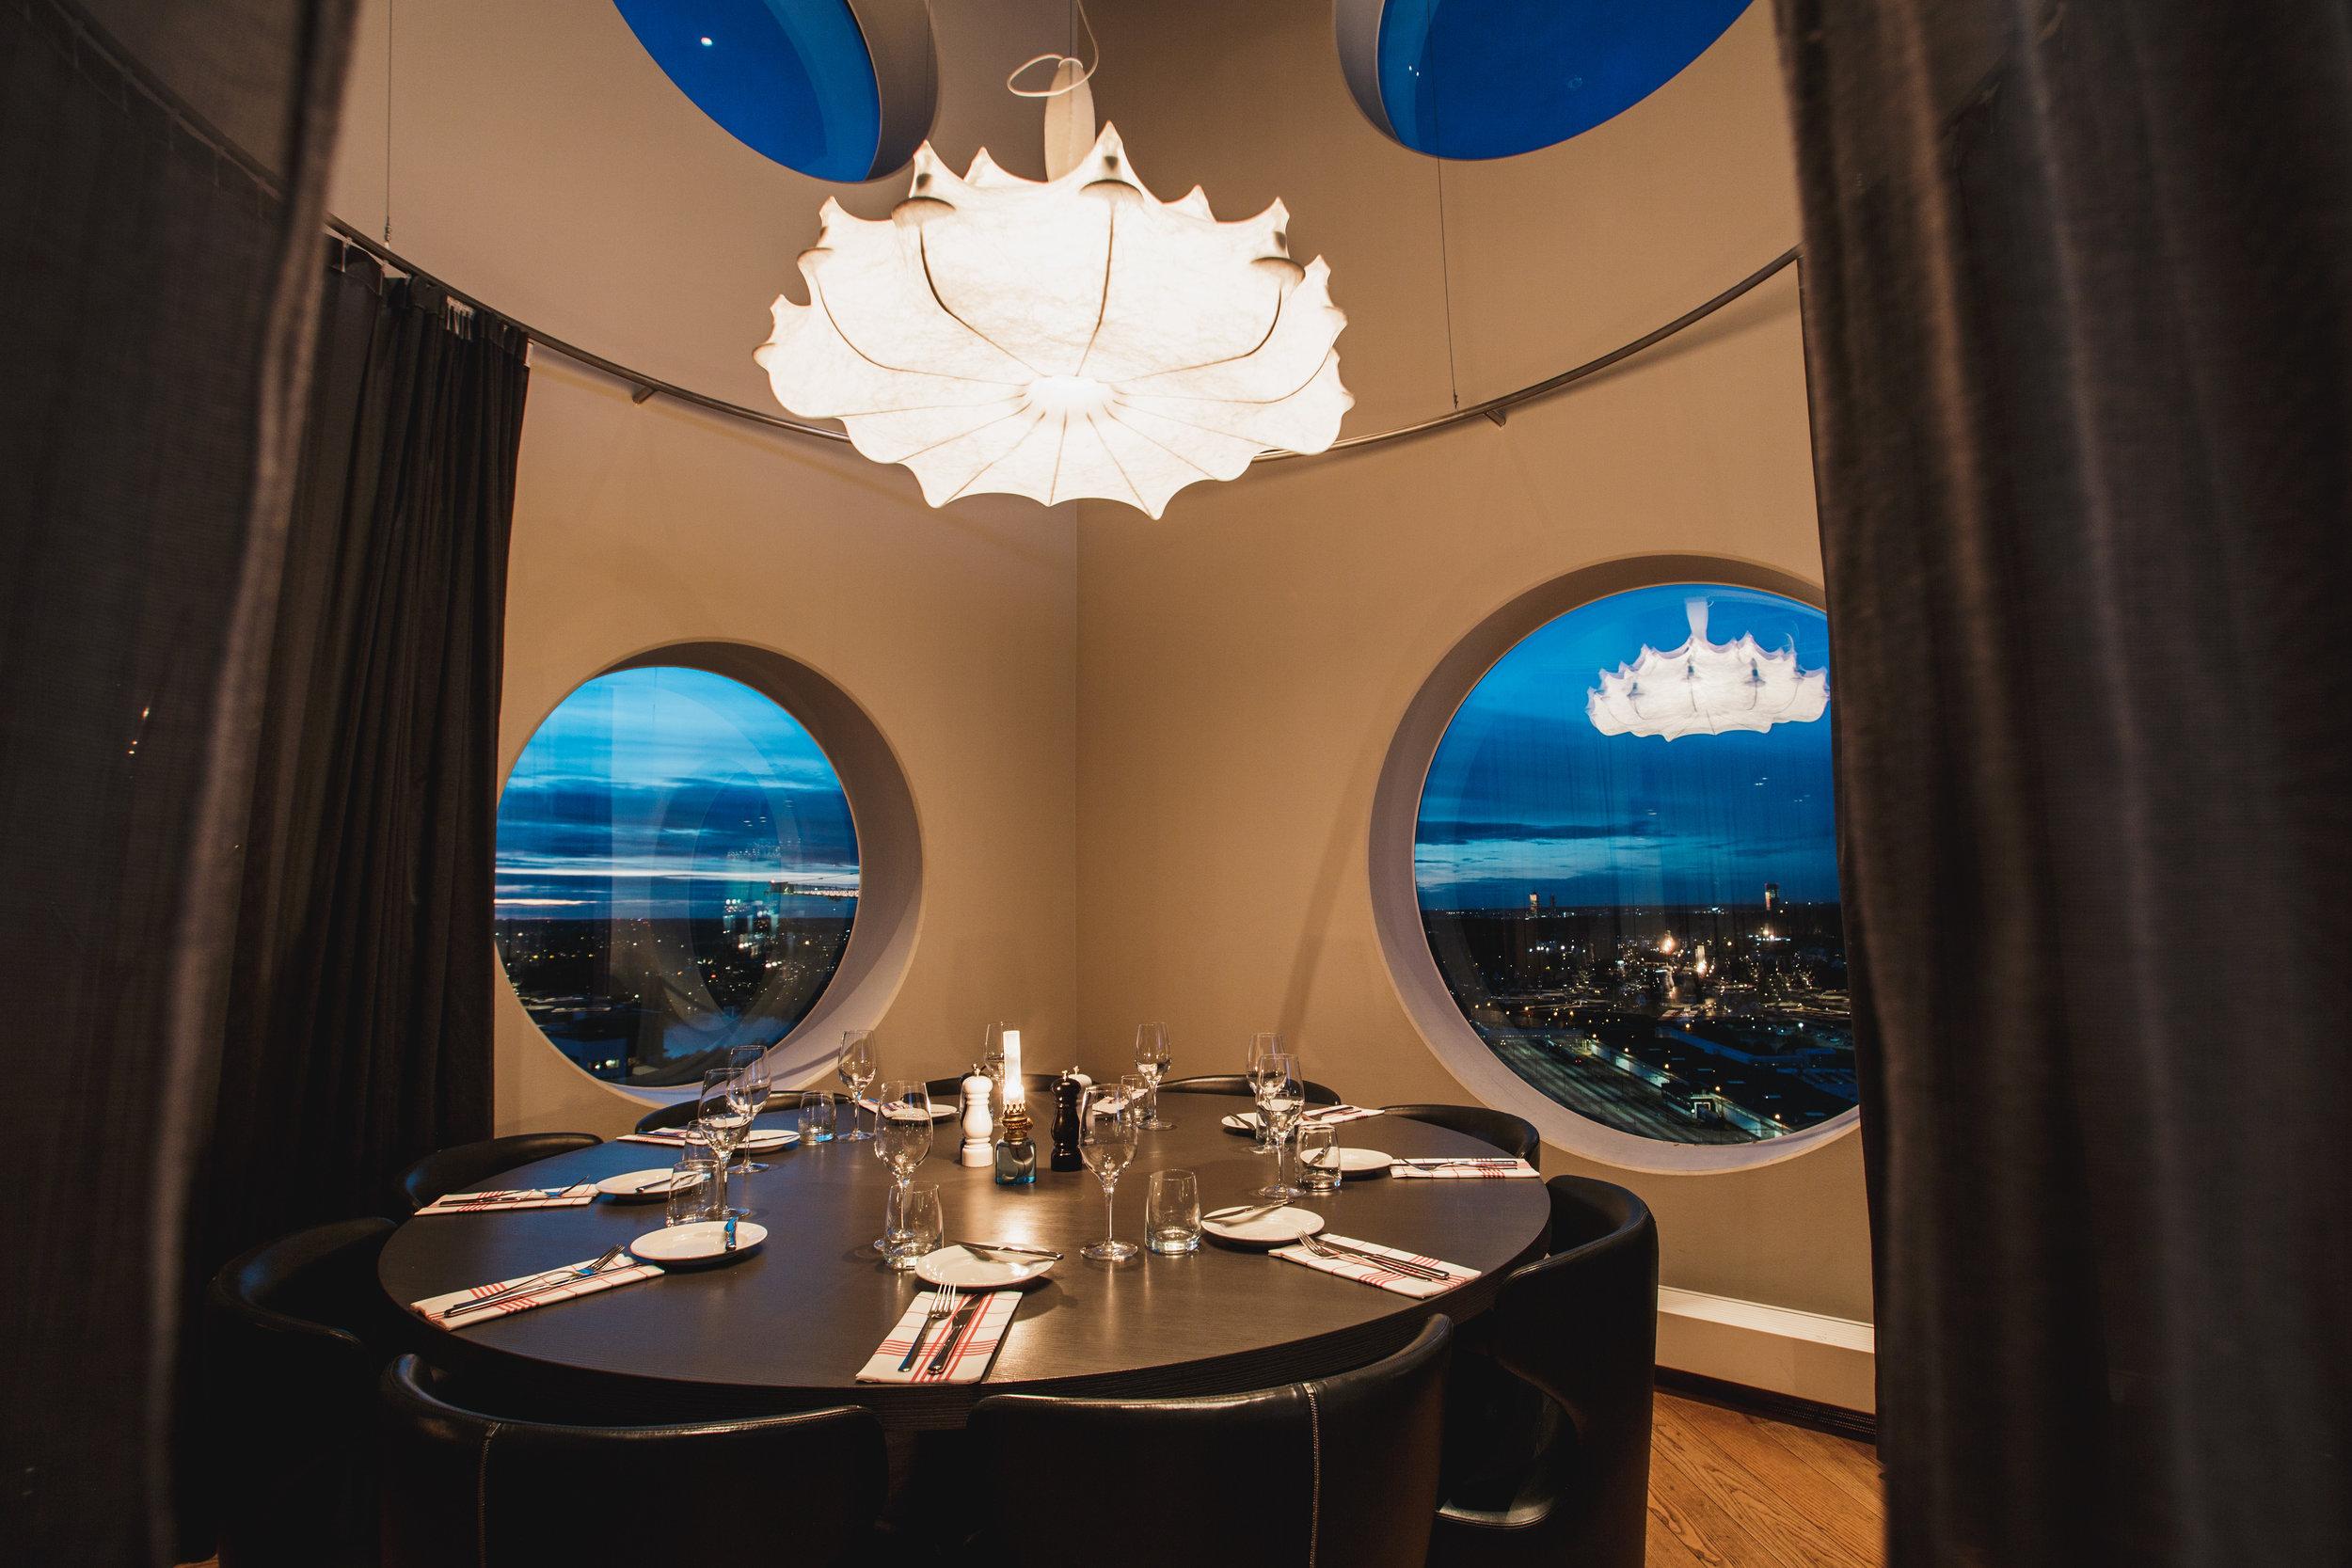 Quality-Hotel-Friends-BrasserieX-round-table.jpg